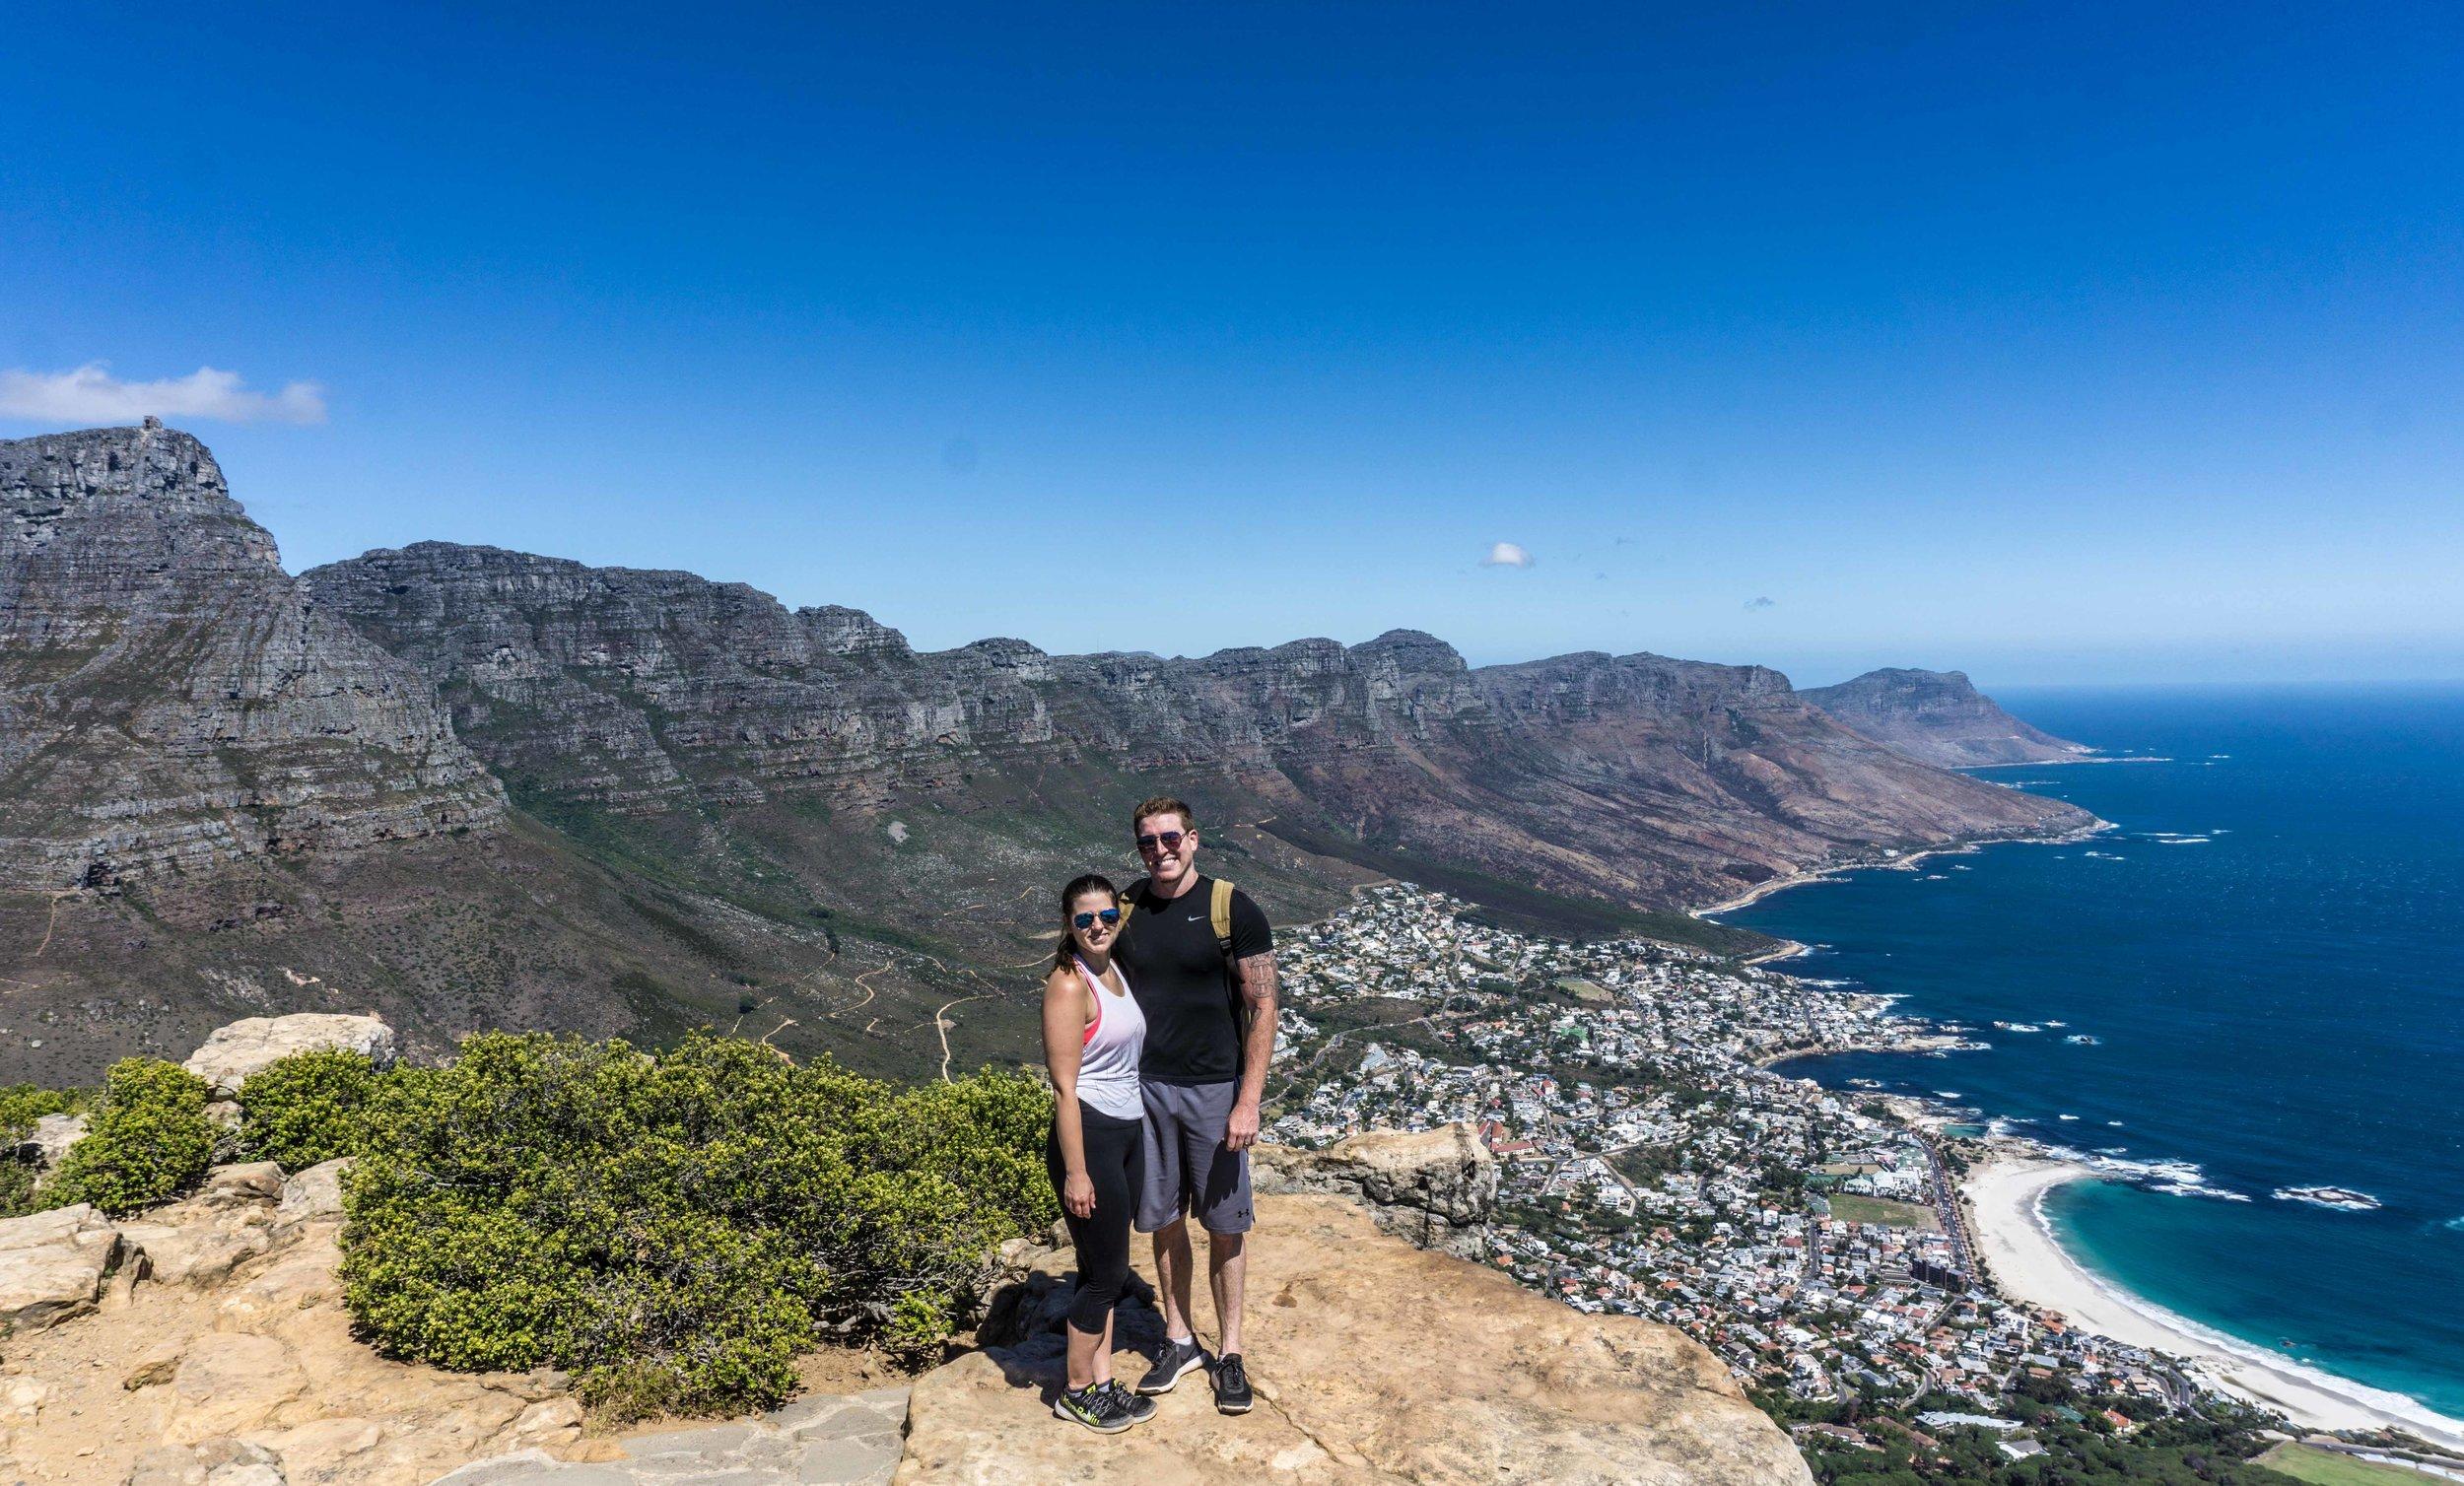 South-Africa-06941.jpg